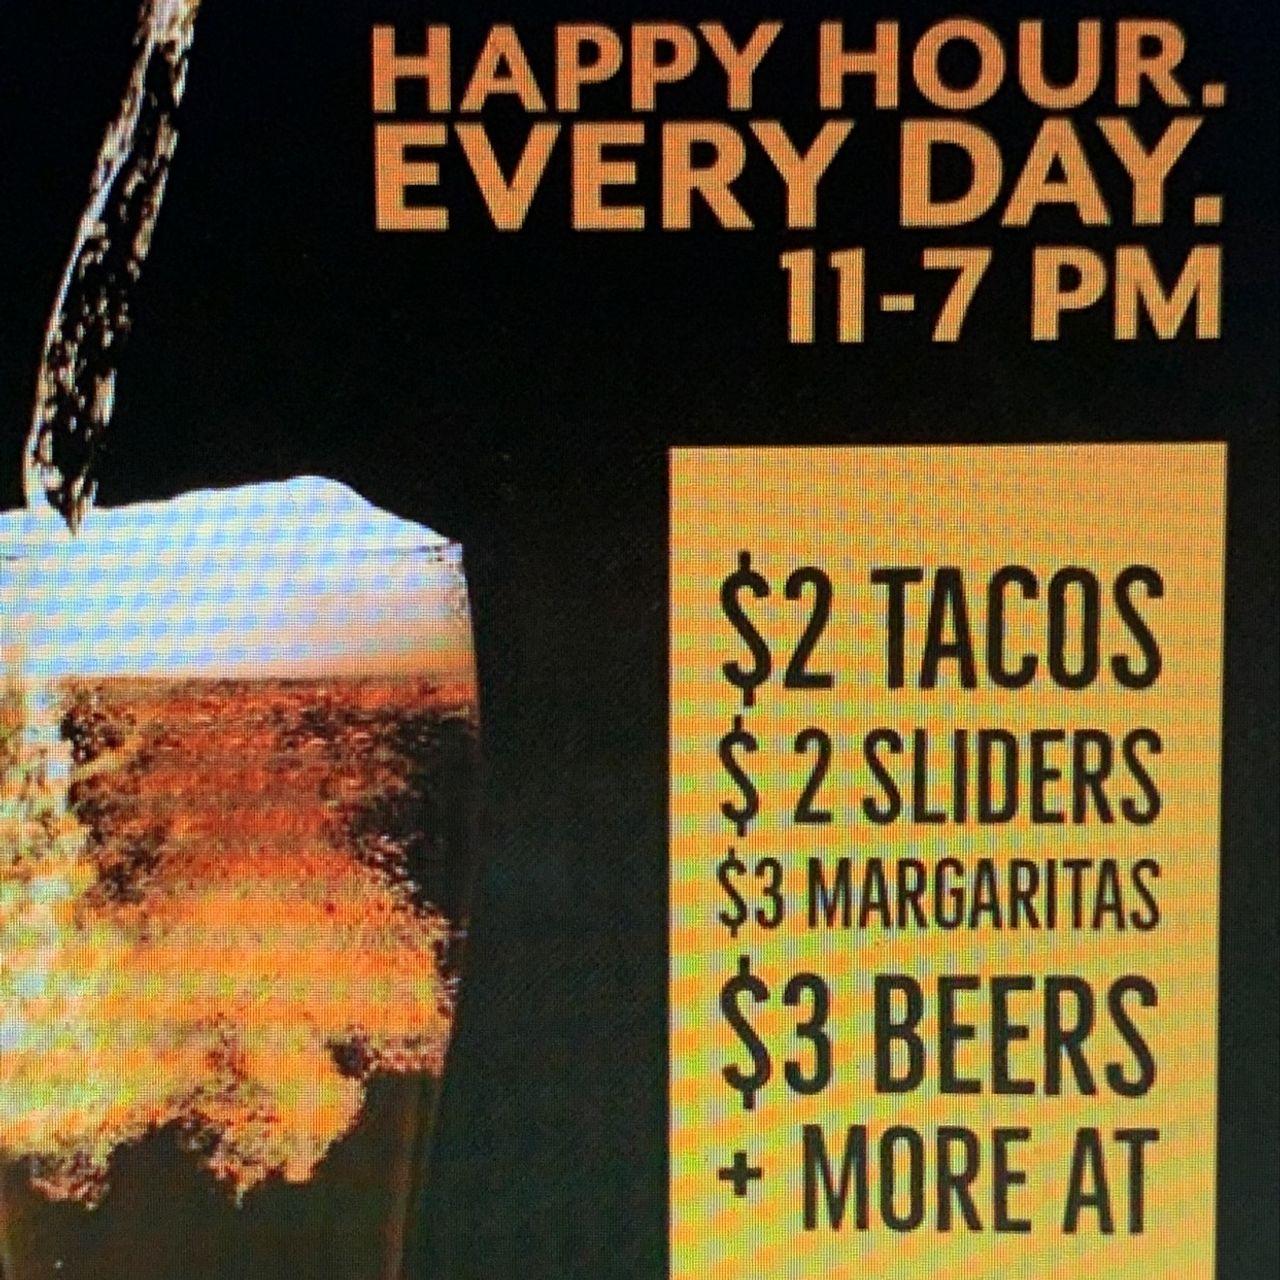 Happy Hour Wednesday Specials!!